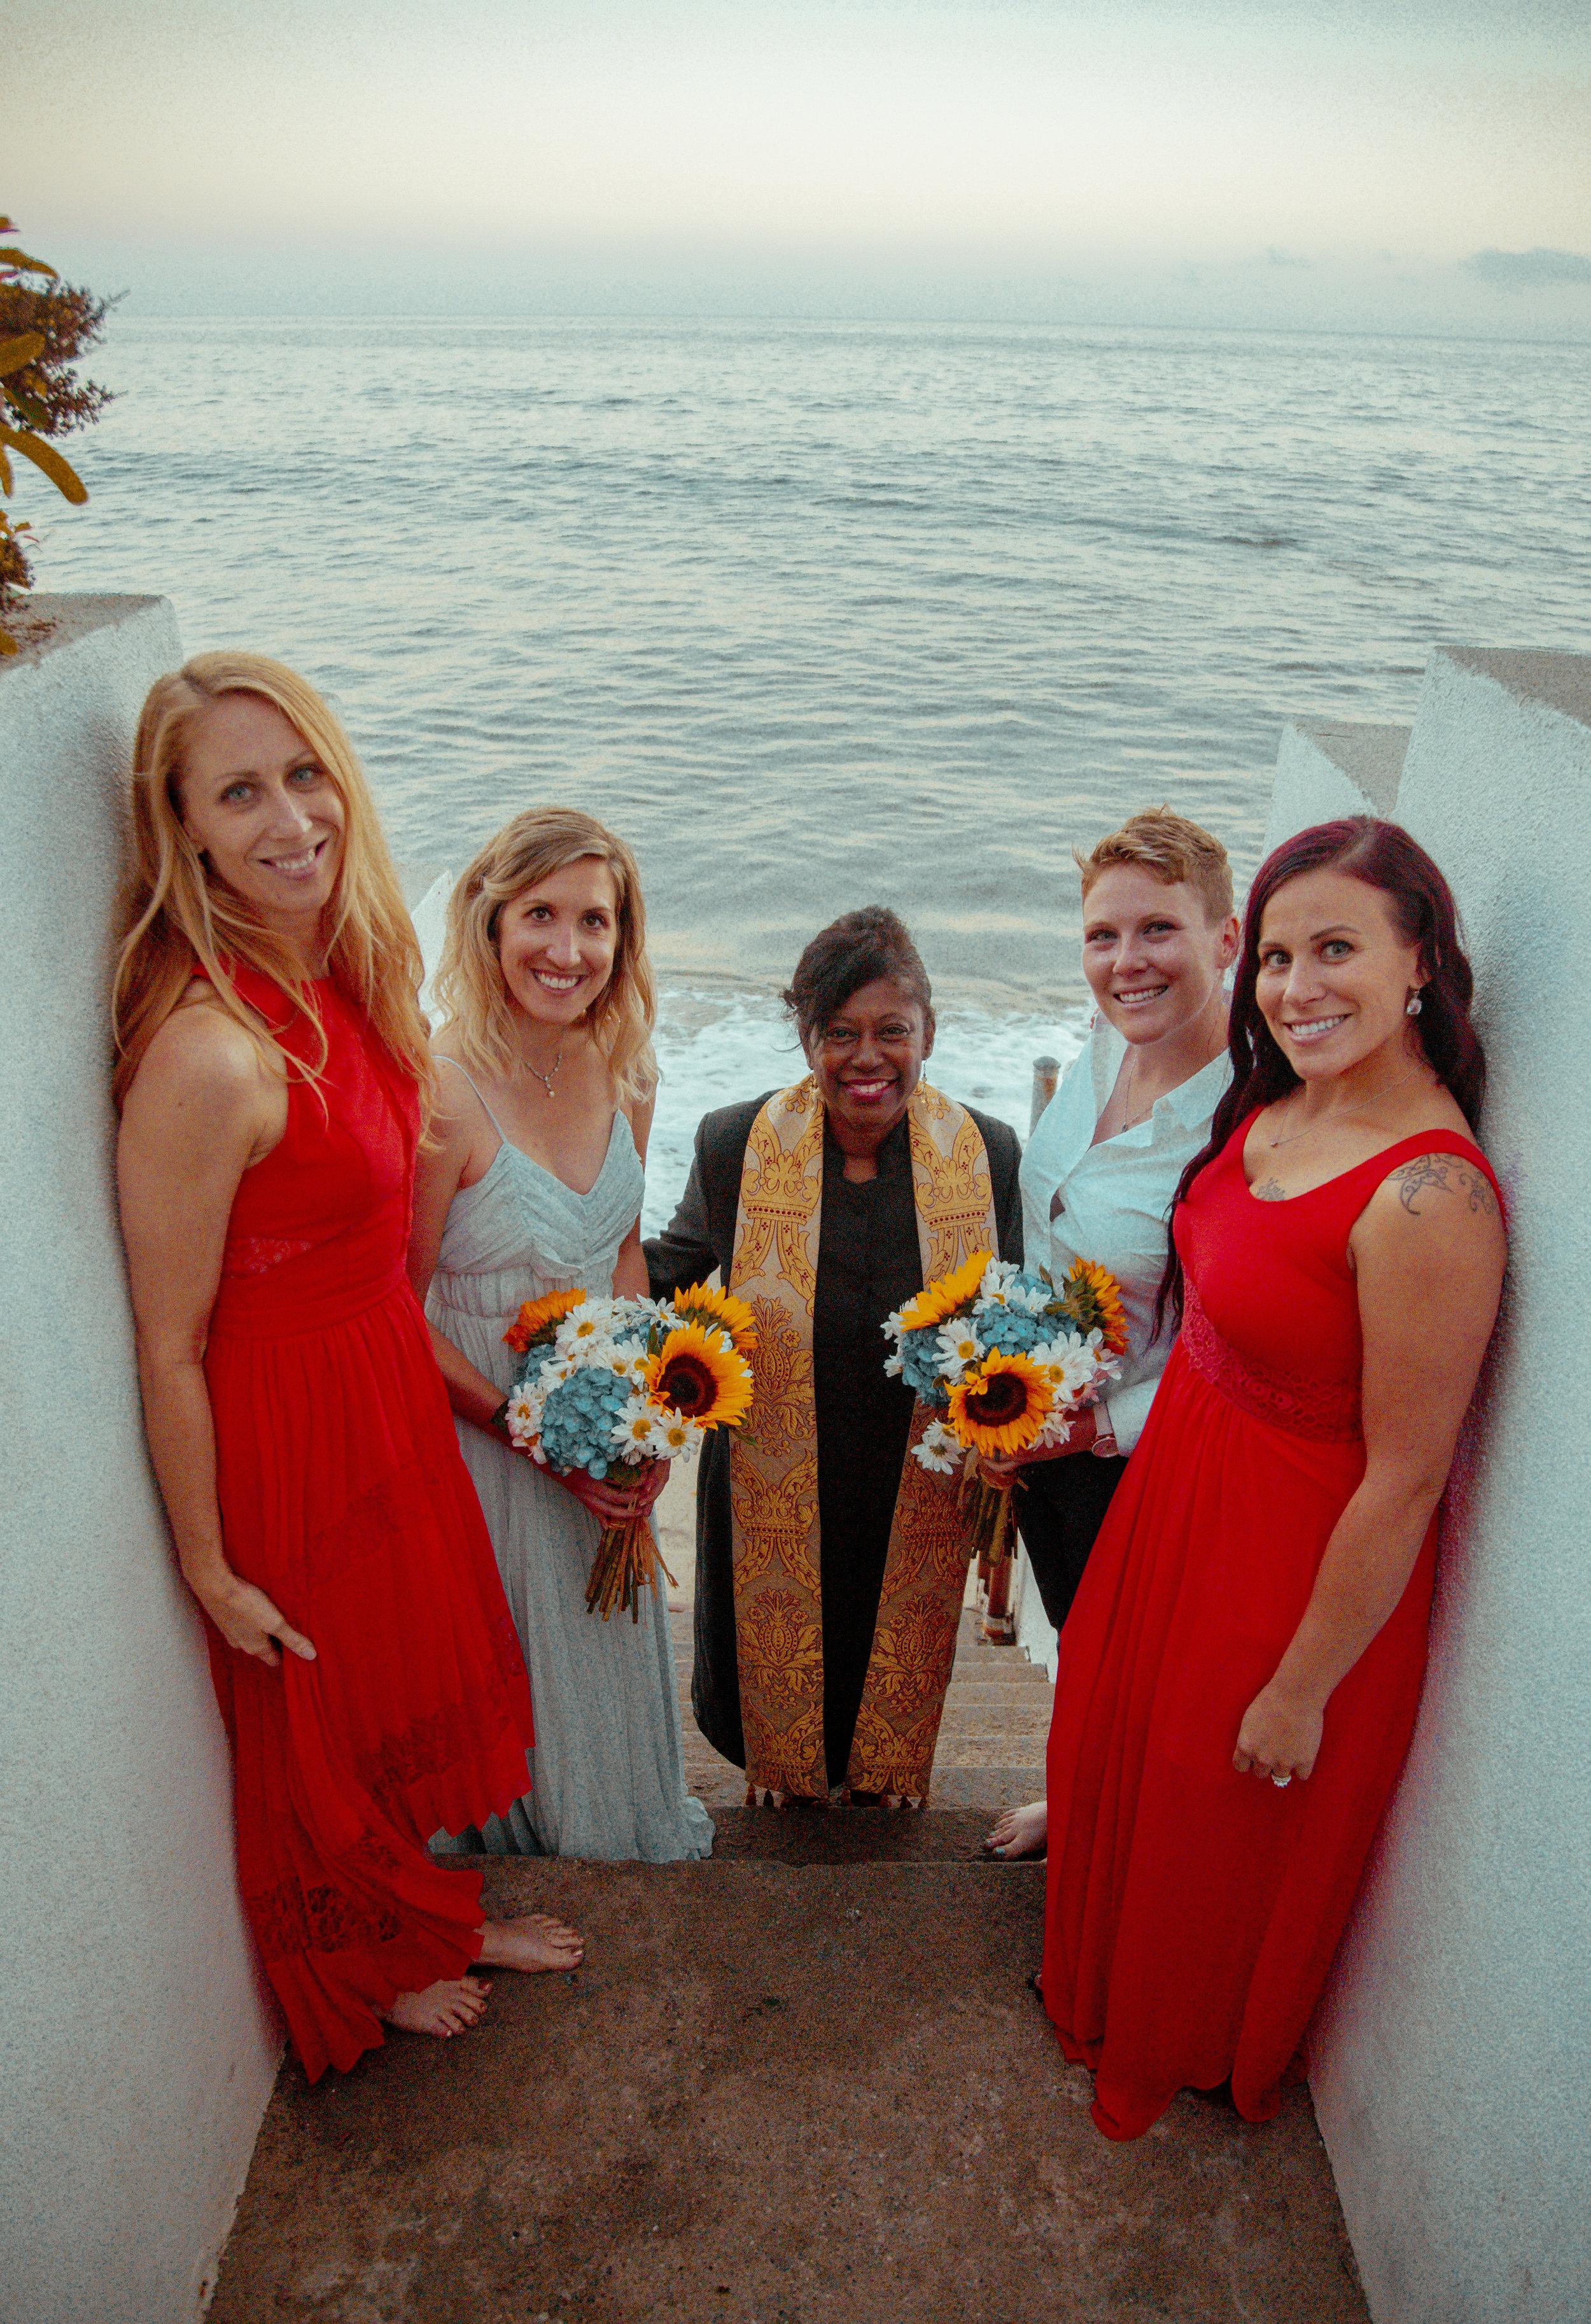 Hannah_&_Kates_Wedding_Oct_5th_2018_0_69.JPG